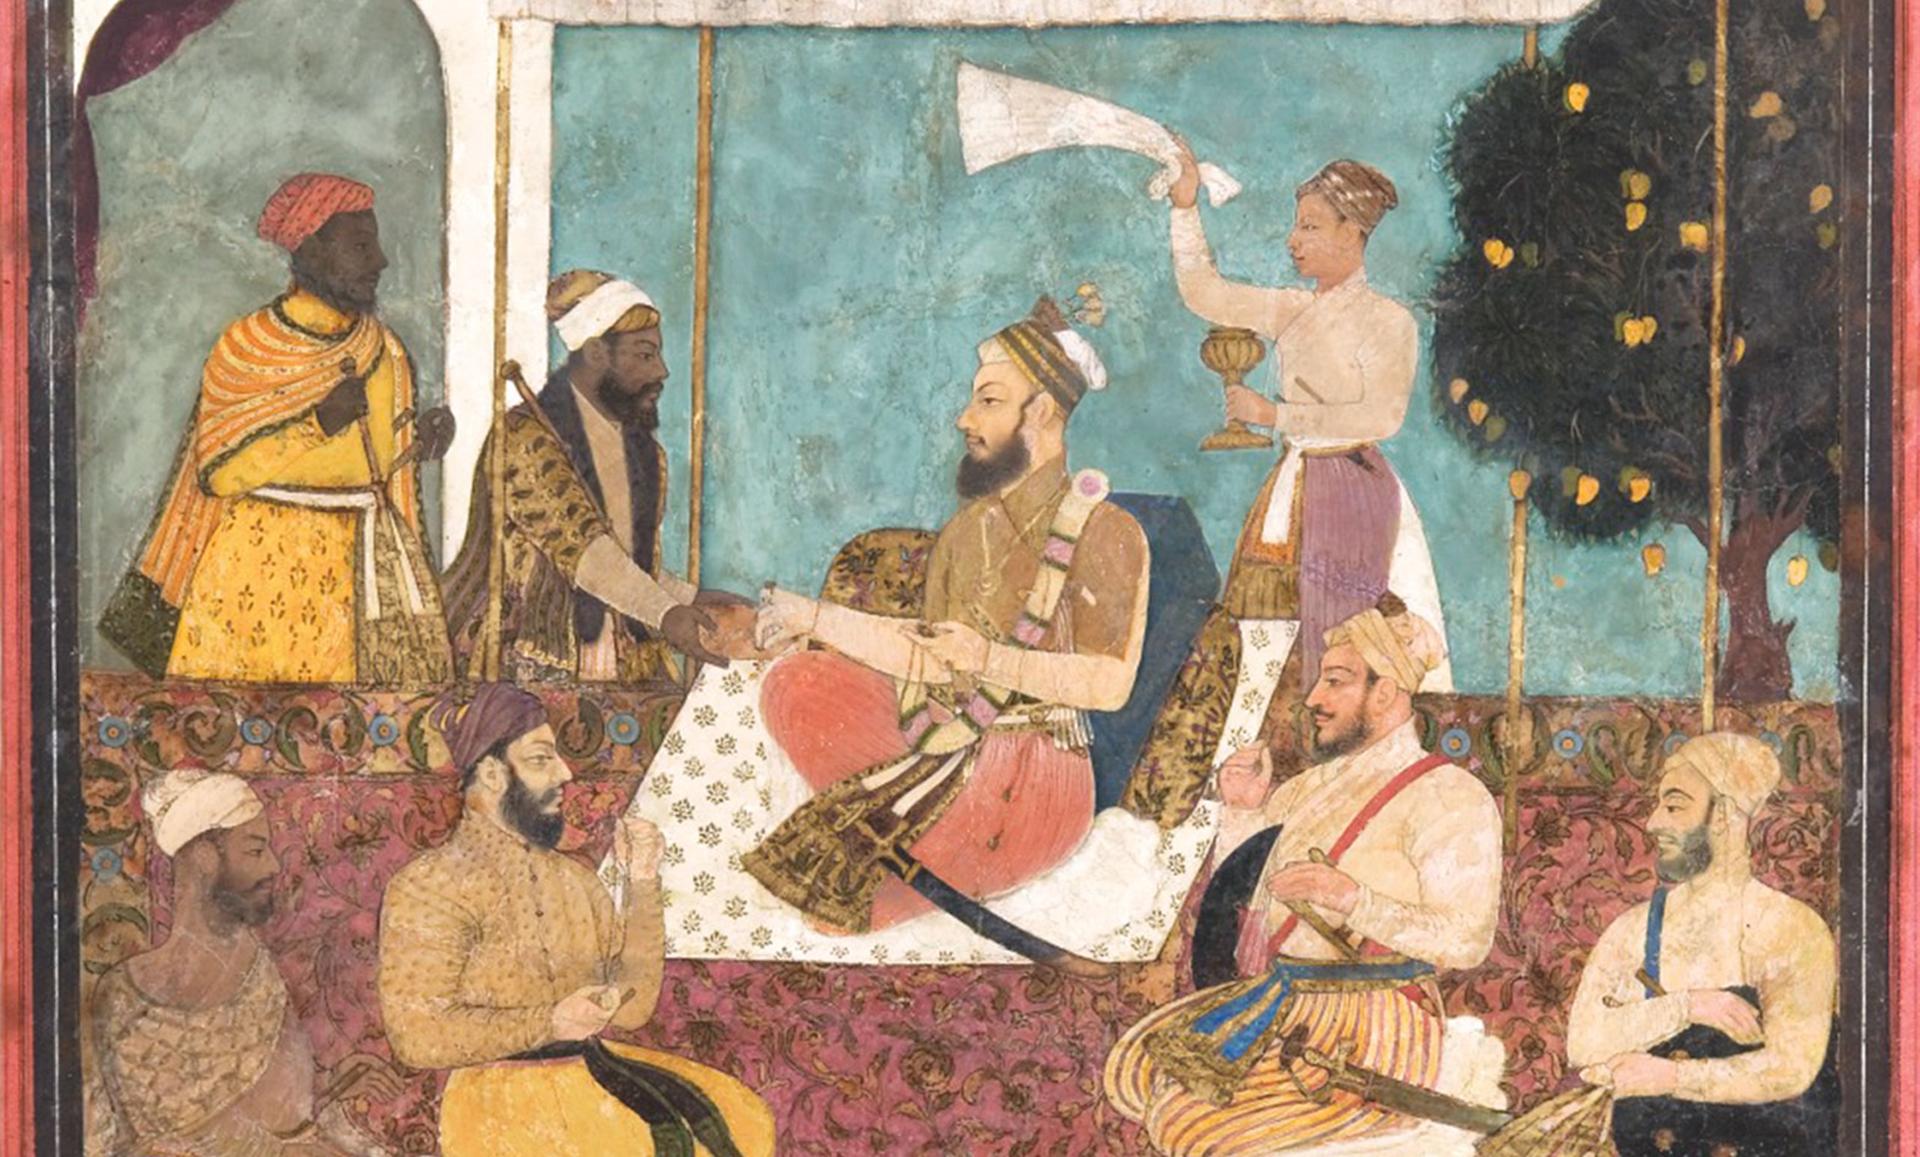 Muhammad Adil Shah Selects a Jewel, 1990.443